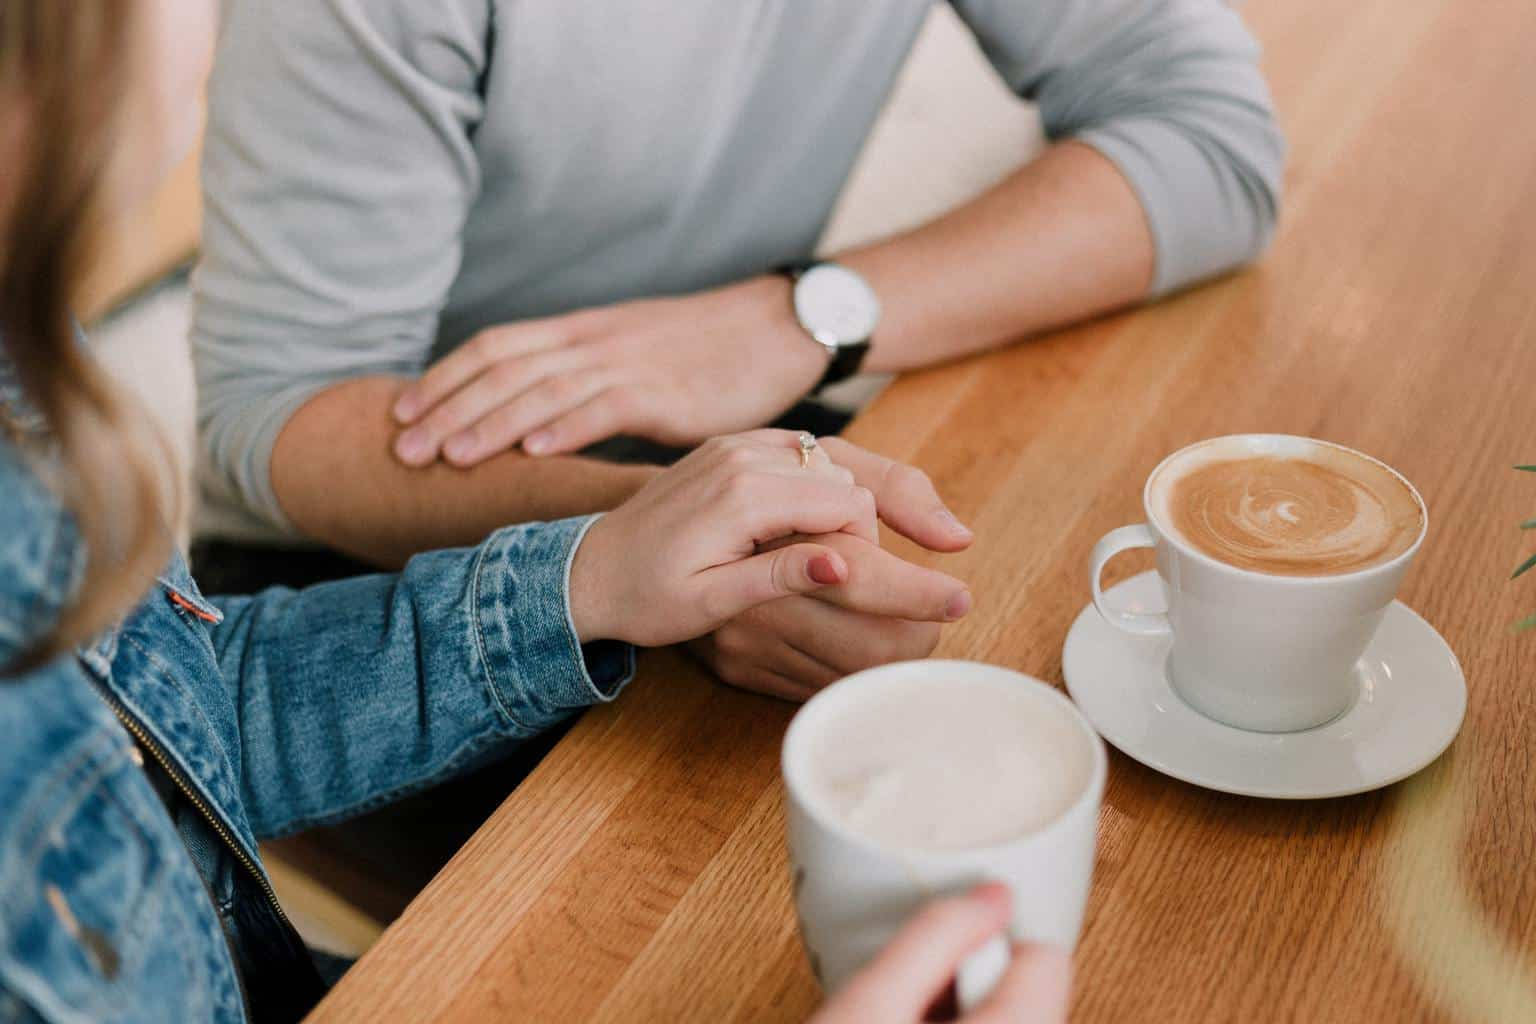 Influencer Activation: Best Ways to Activate Influencer Relationships